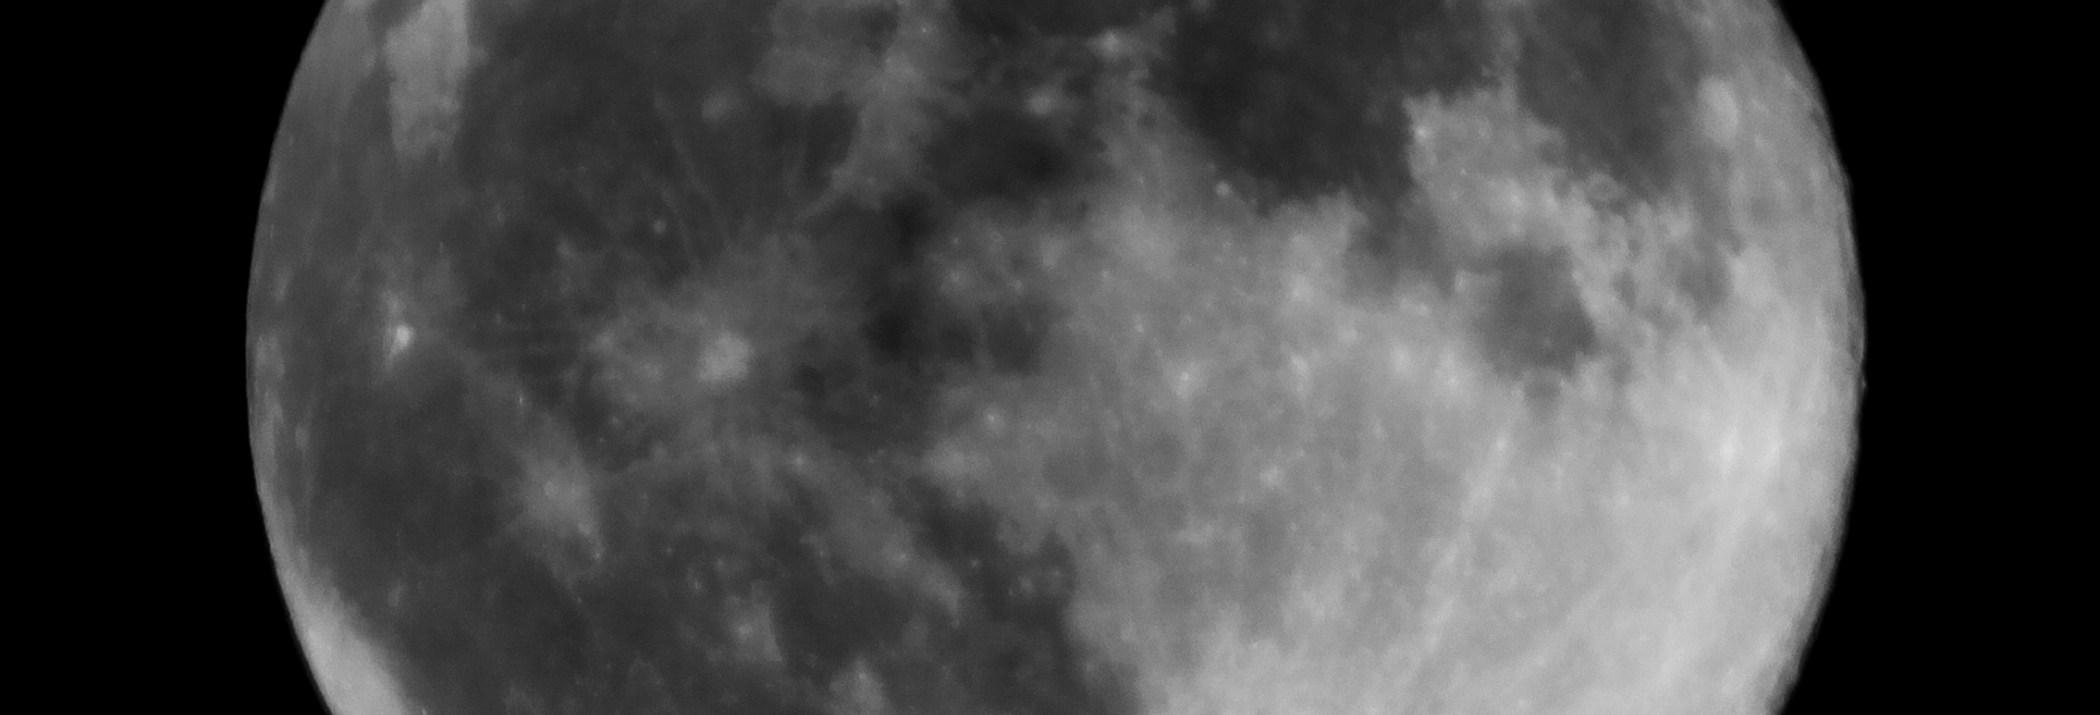 moon-ras-pi-final